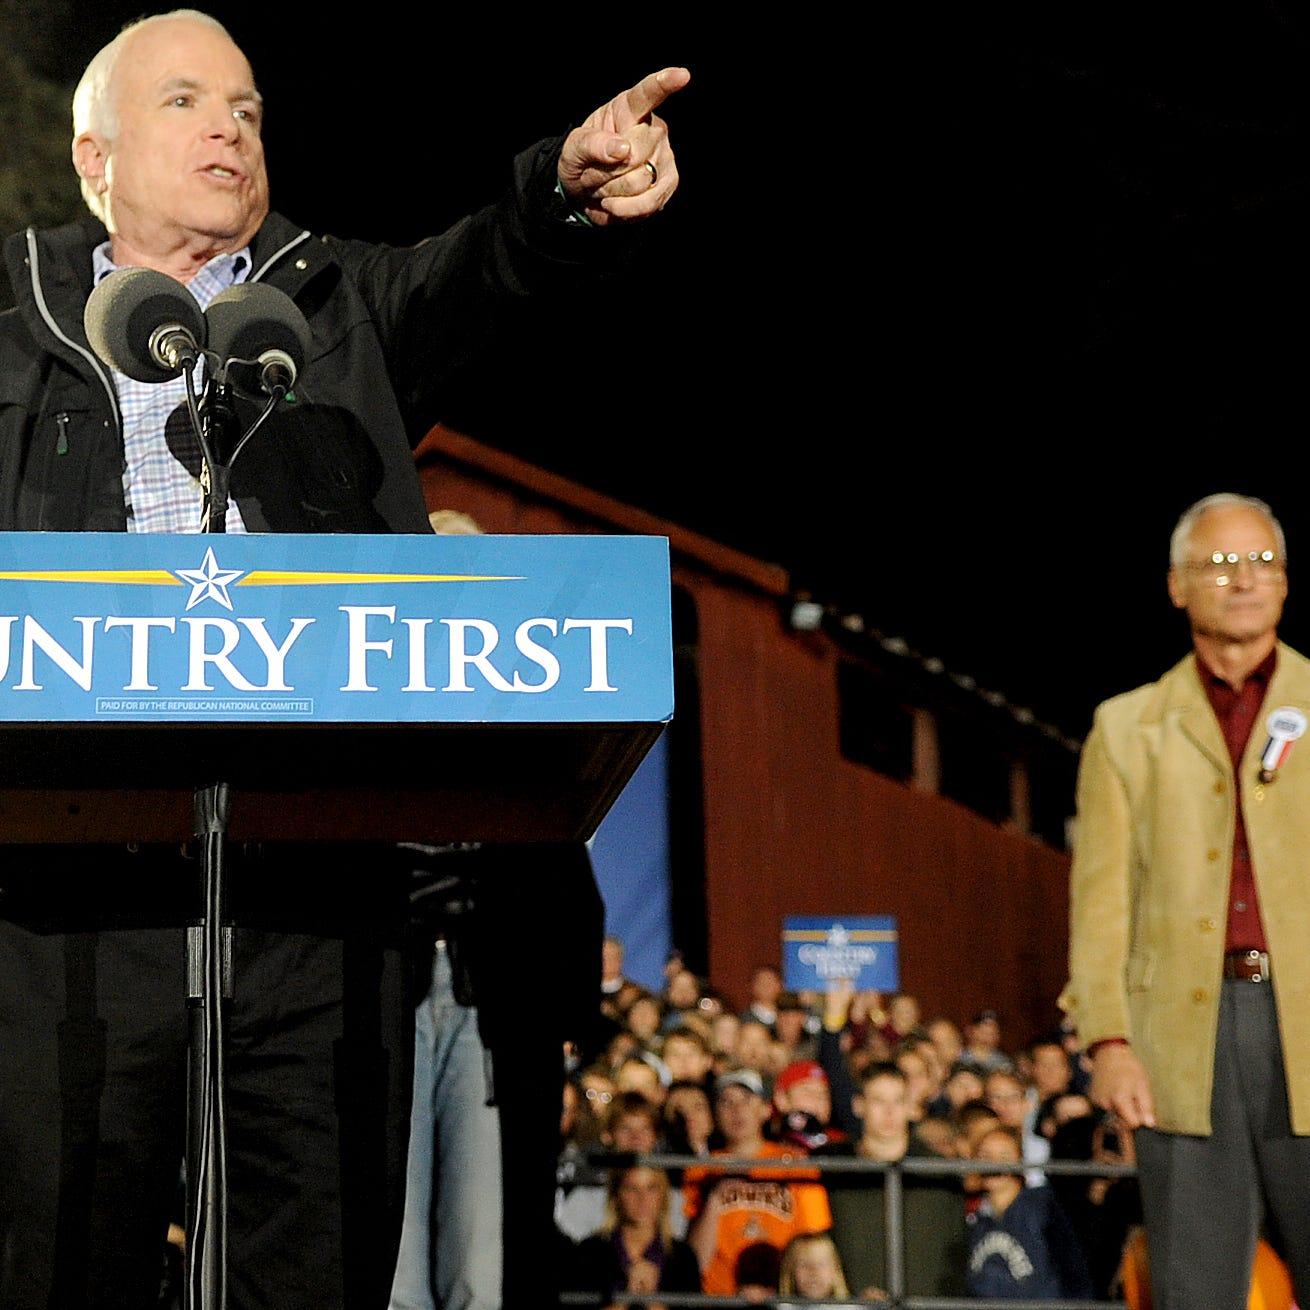 Saluting John McCain